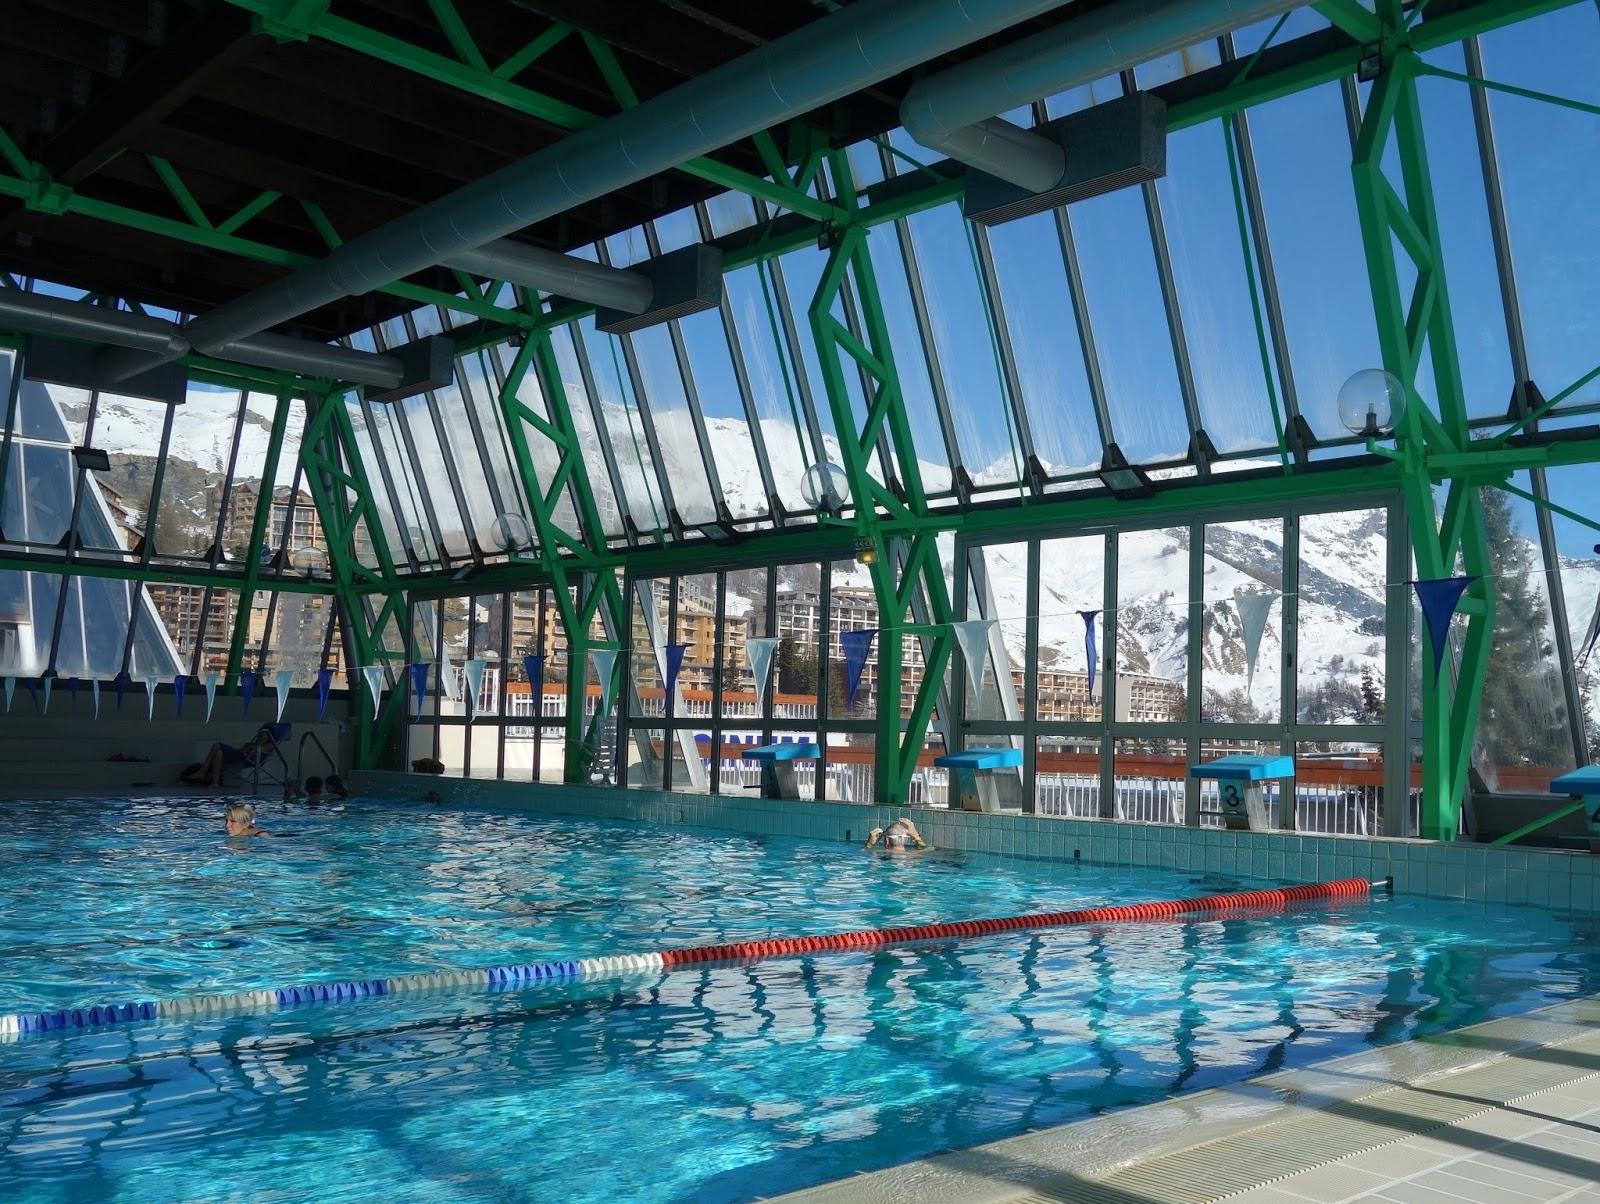 Nos vacances en famille orci res merlette initiales gg for Orcieres piscine